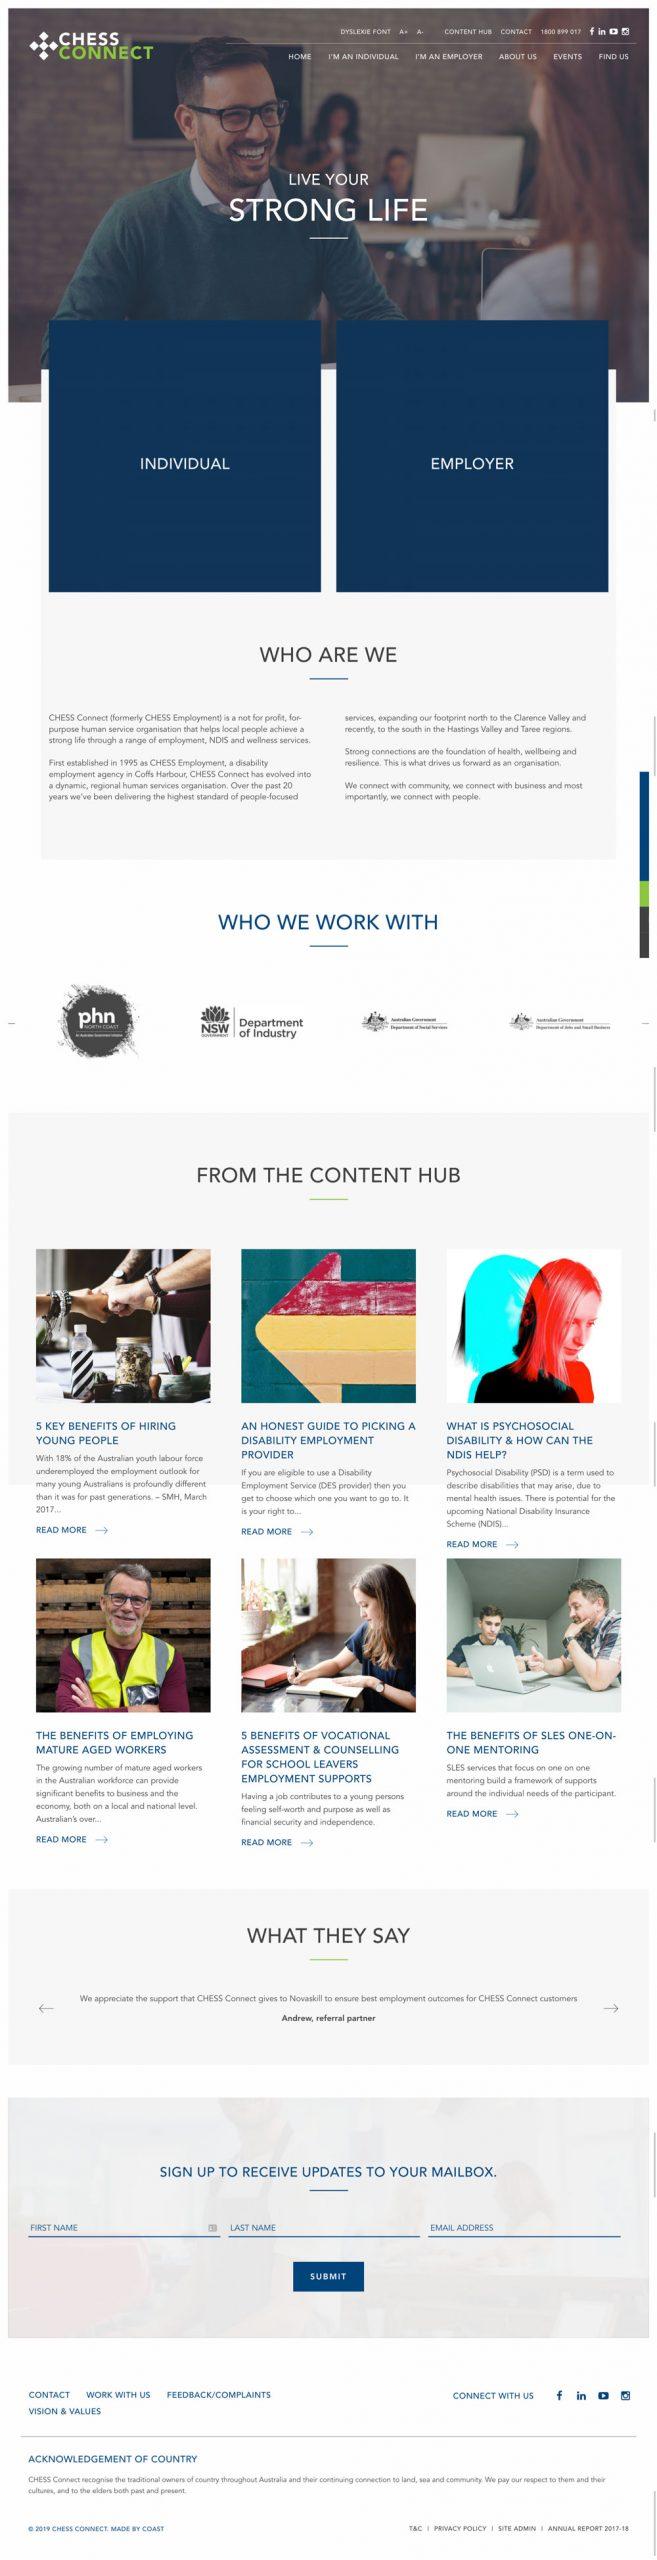 Website Design & Development for Chess Connect